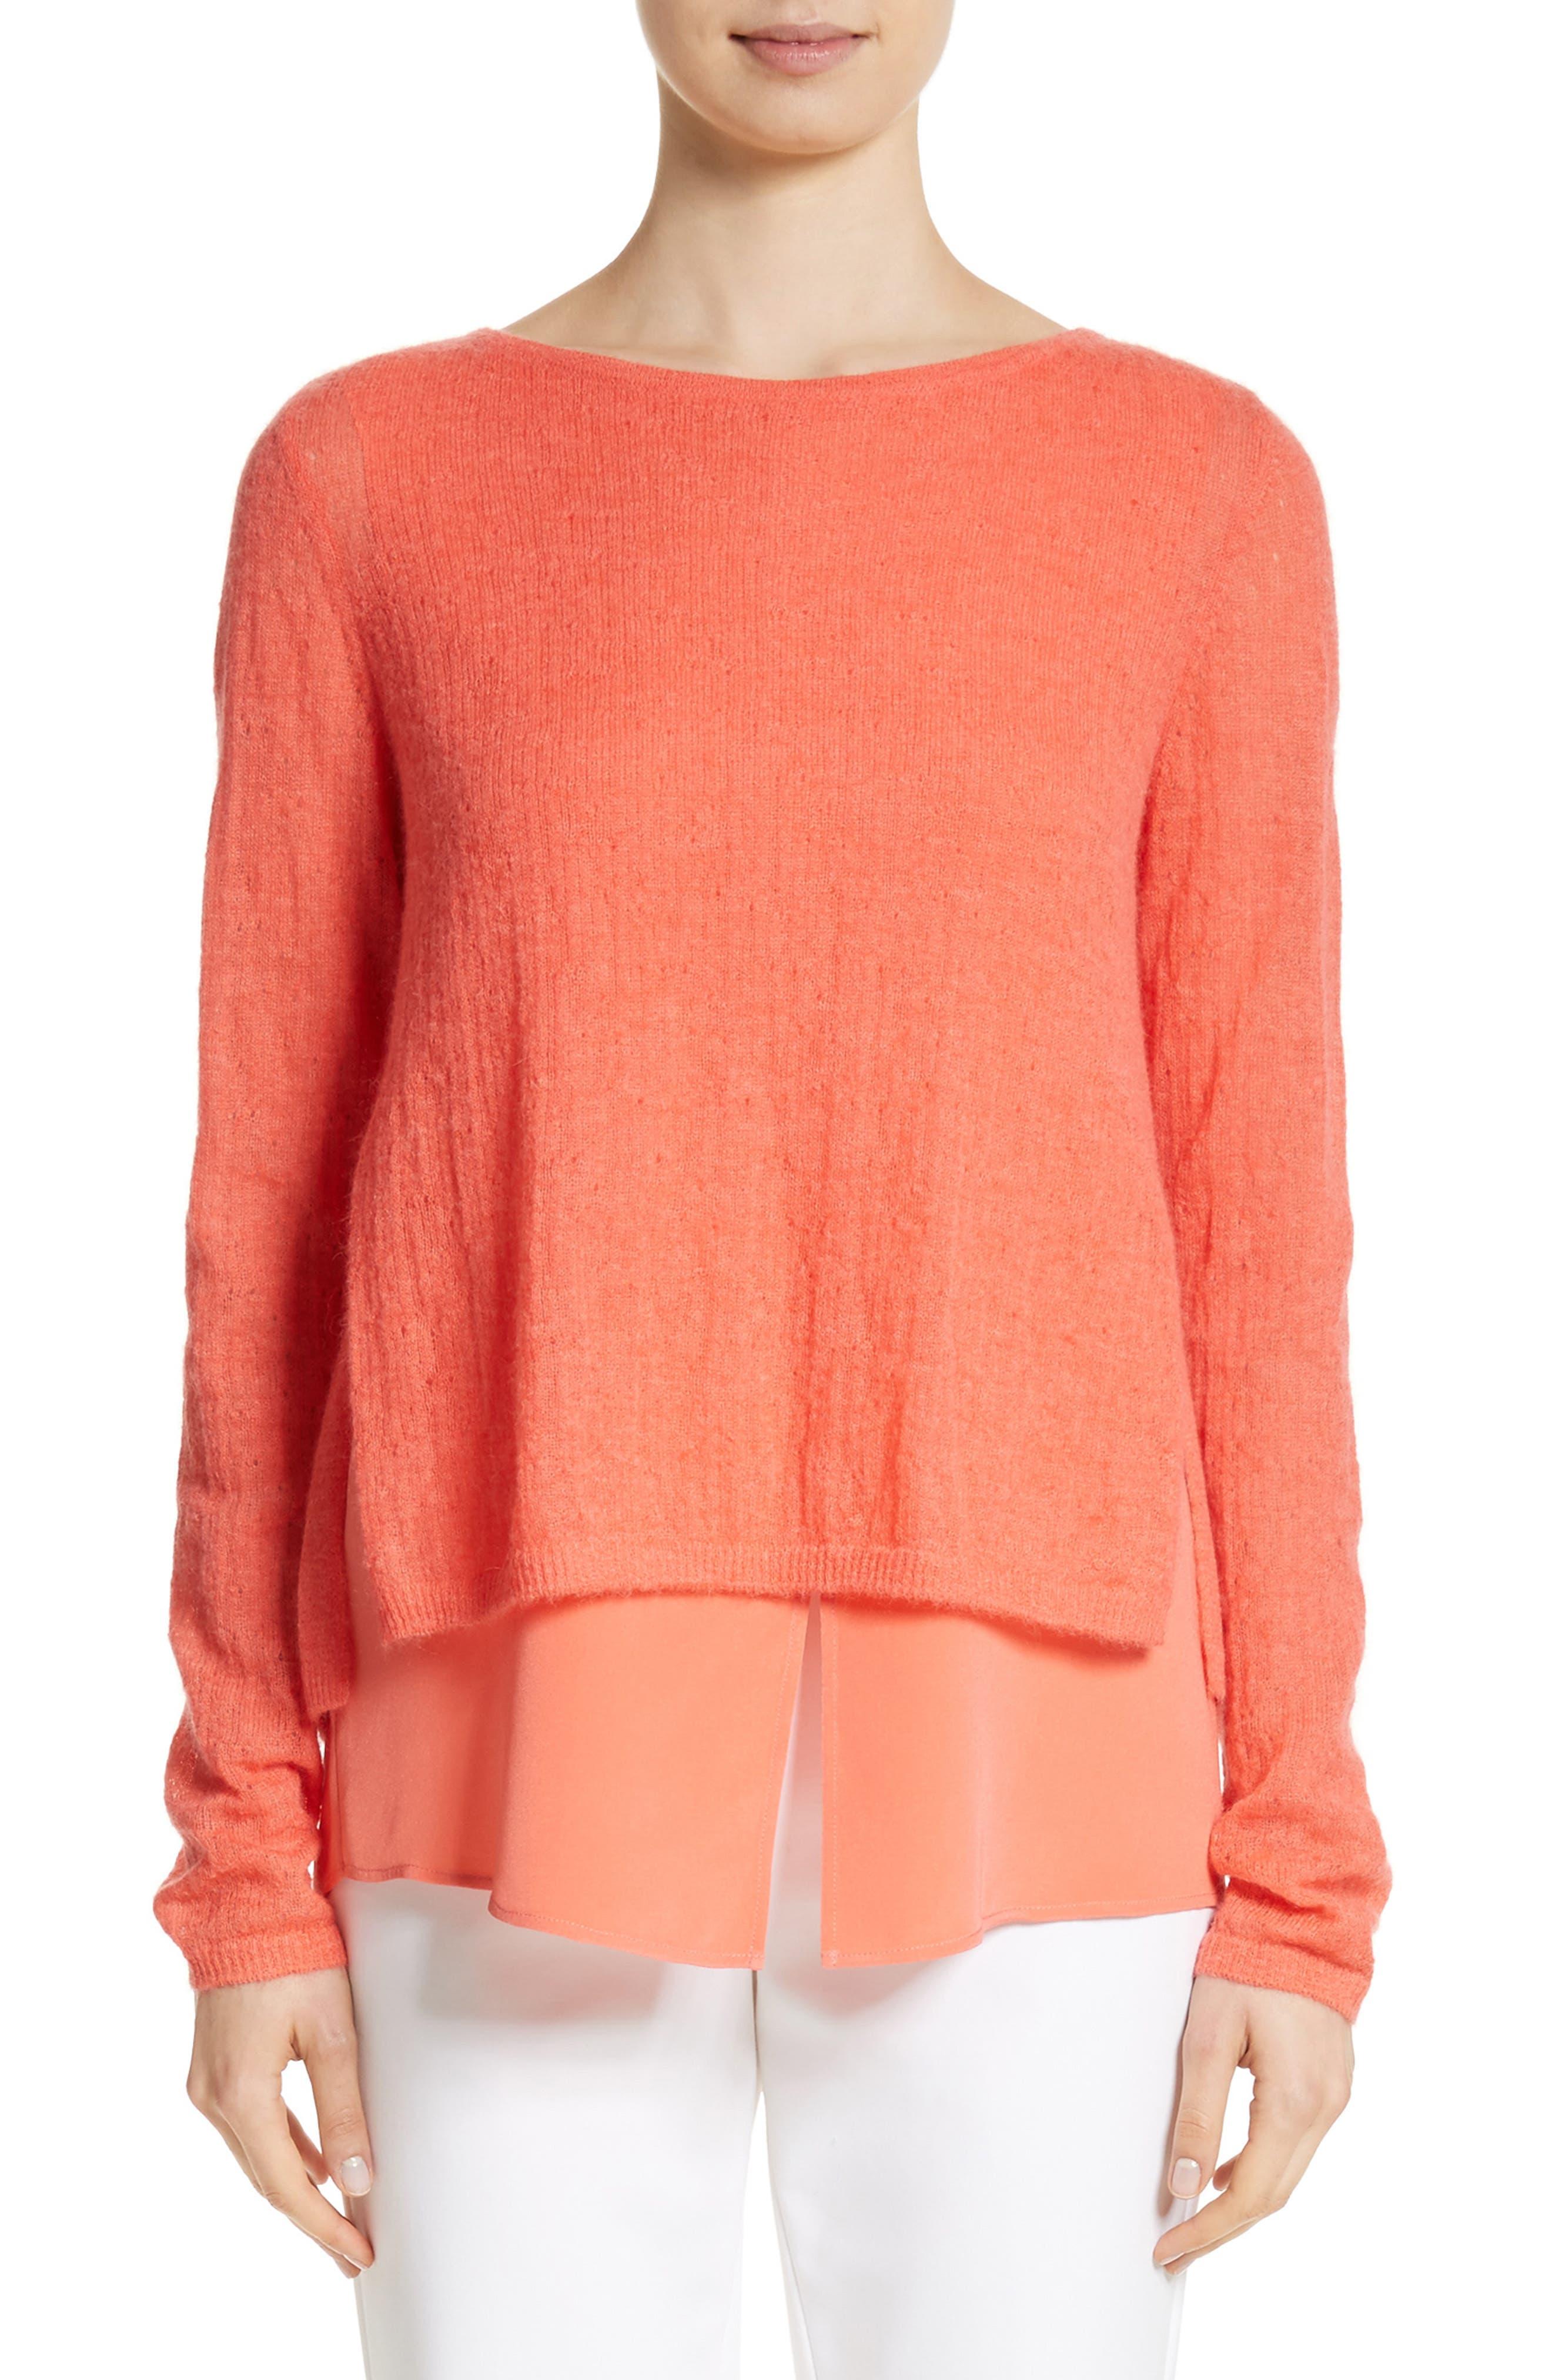 Drop Needle Rib Knit Sweater,                             Main thumbnail 1, color,                             950